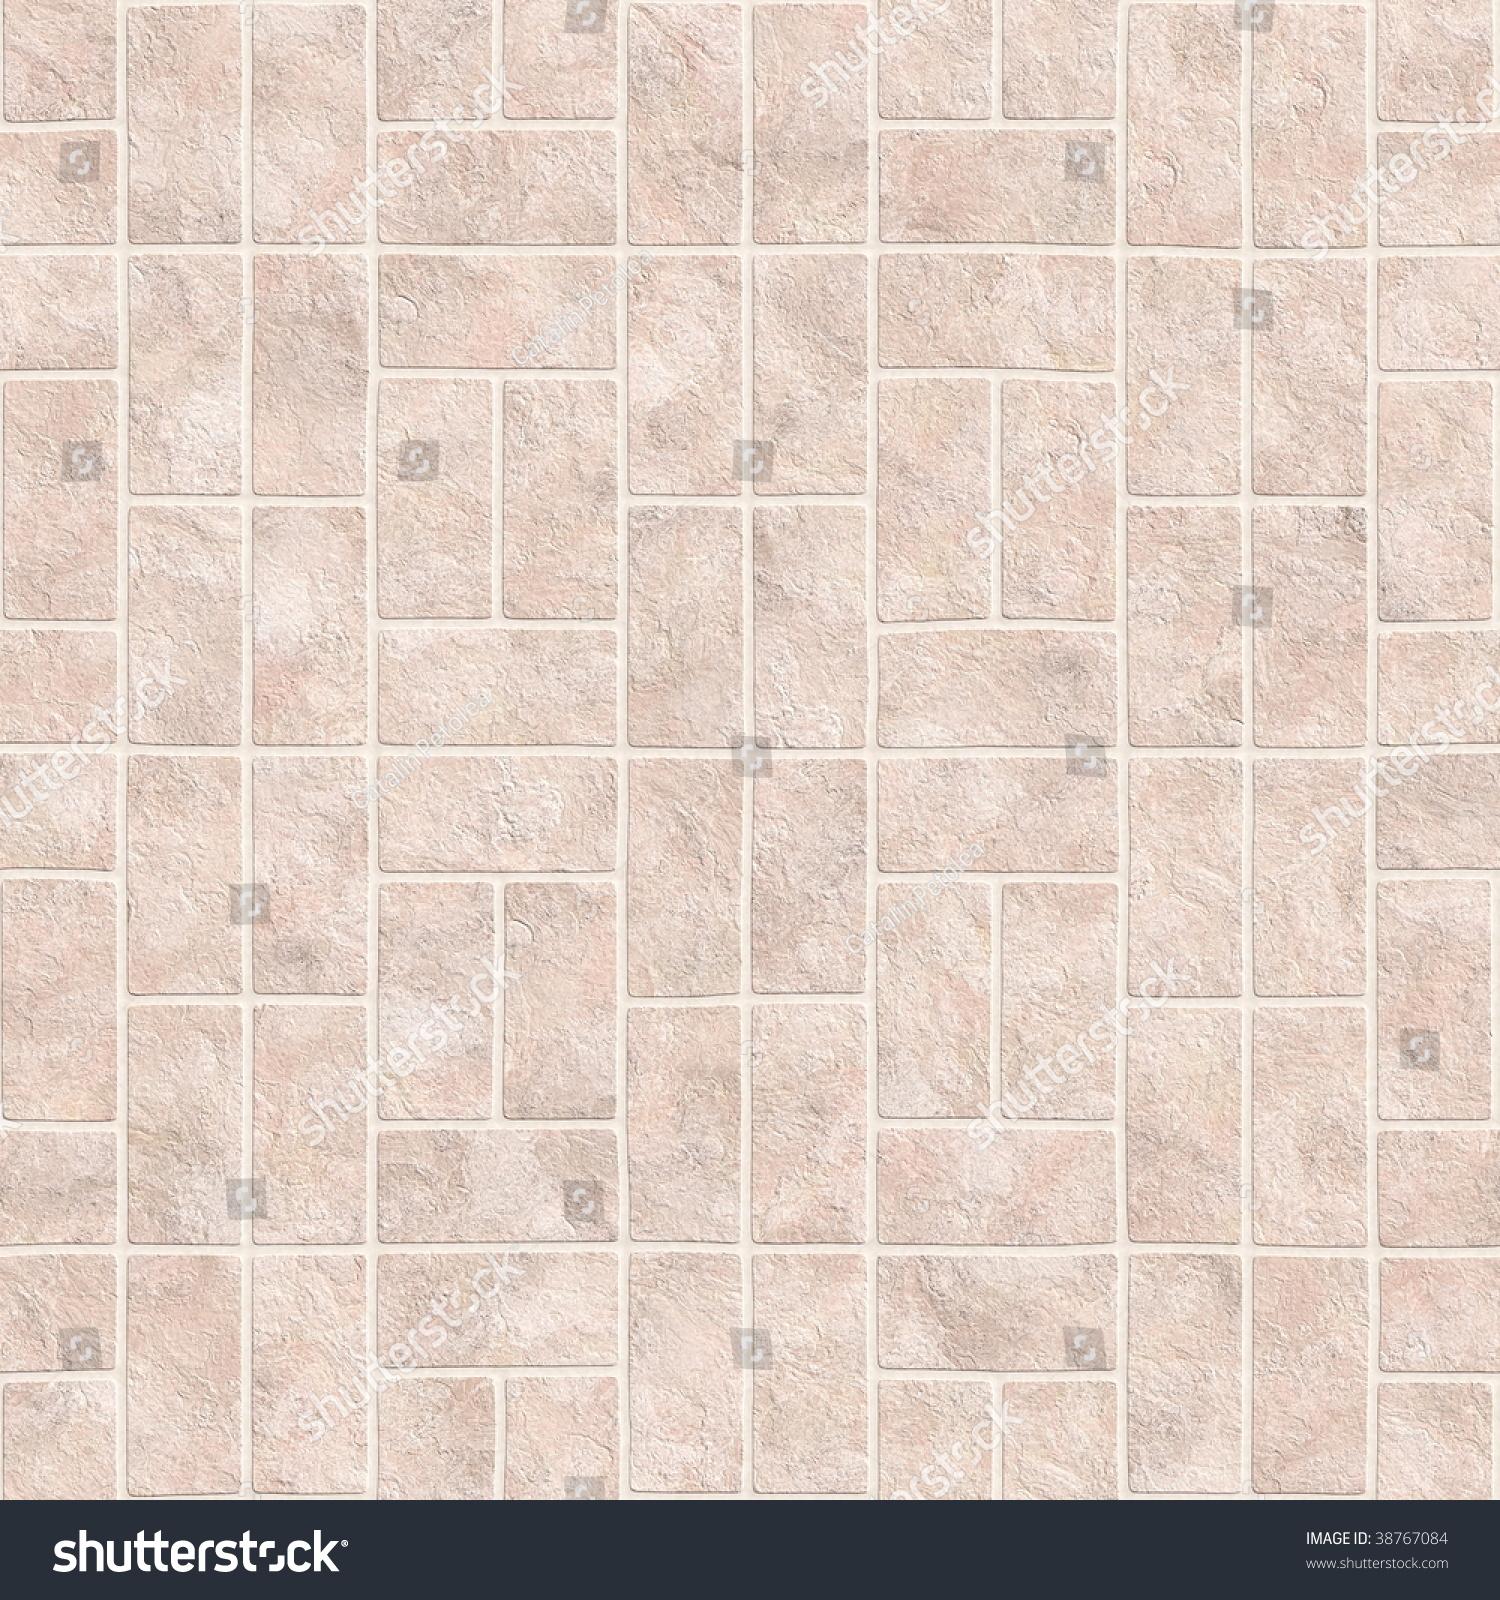 Kitchen Tiles Texture bathroom kitchen tiles texture square format stock photo 38767084